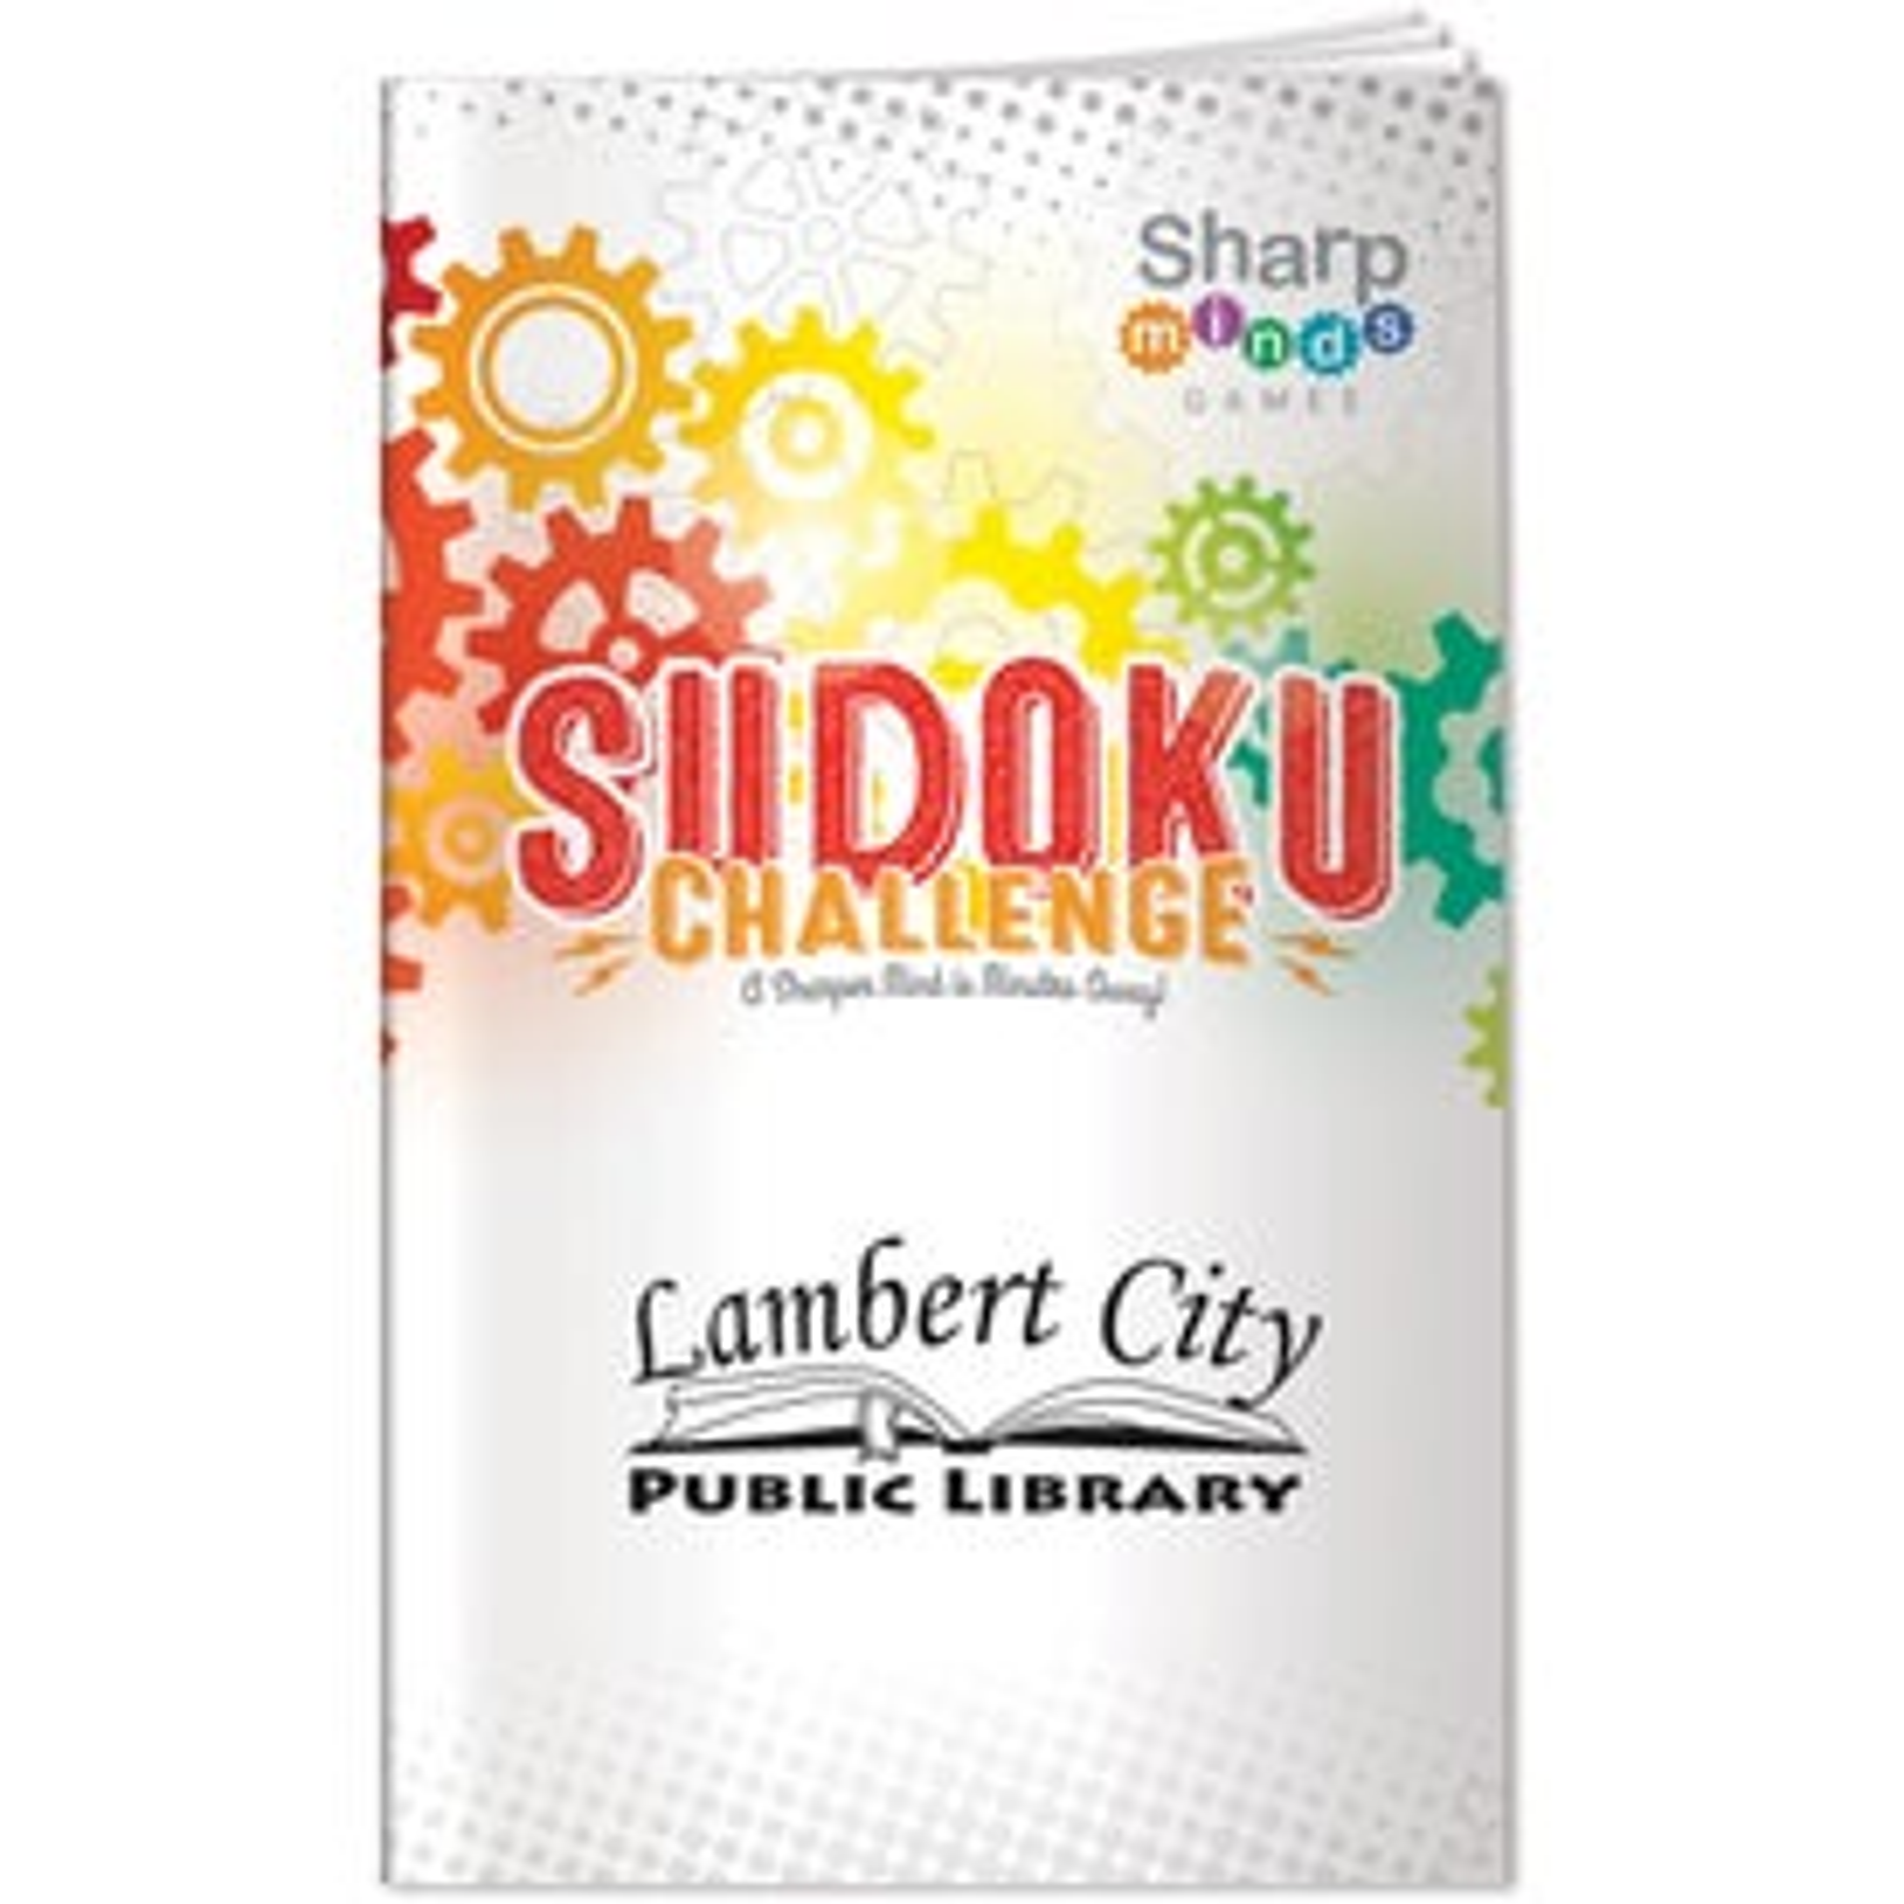 Sharp Minds Games: Sudoku Challenge